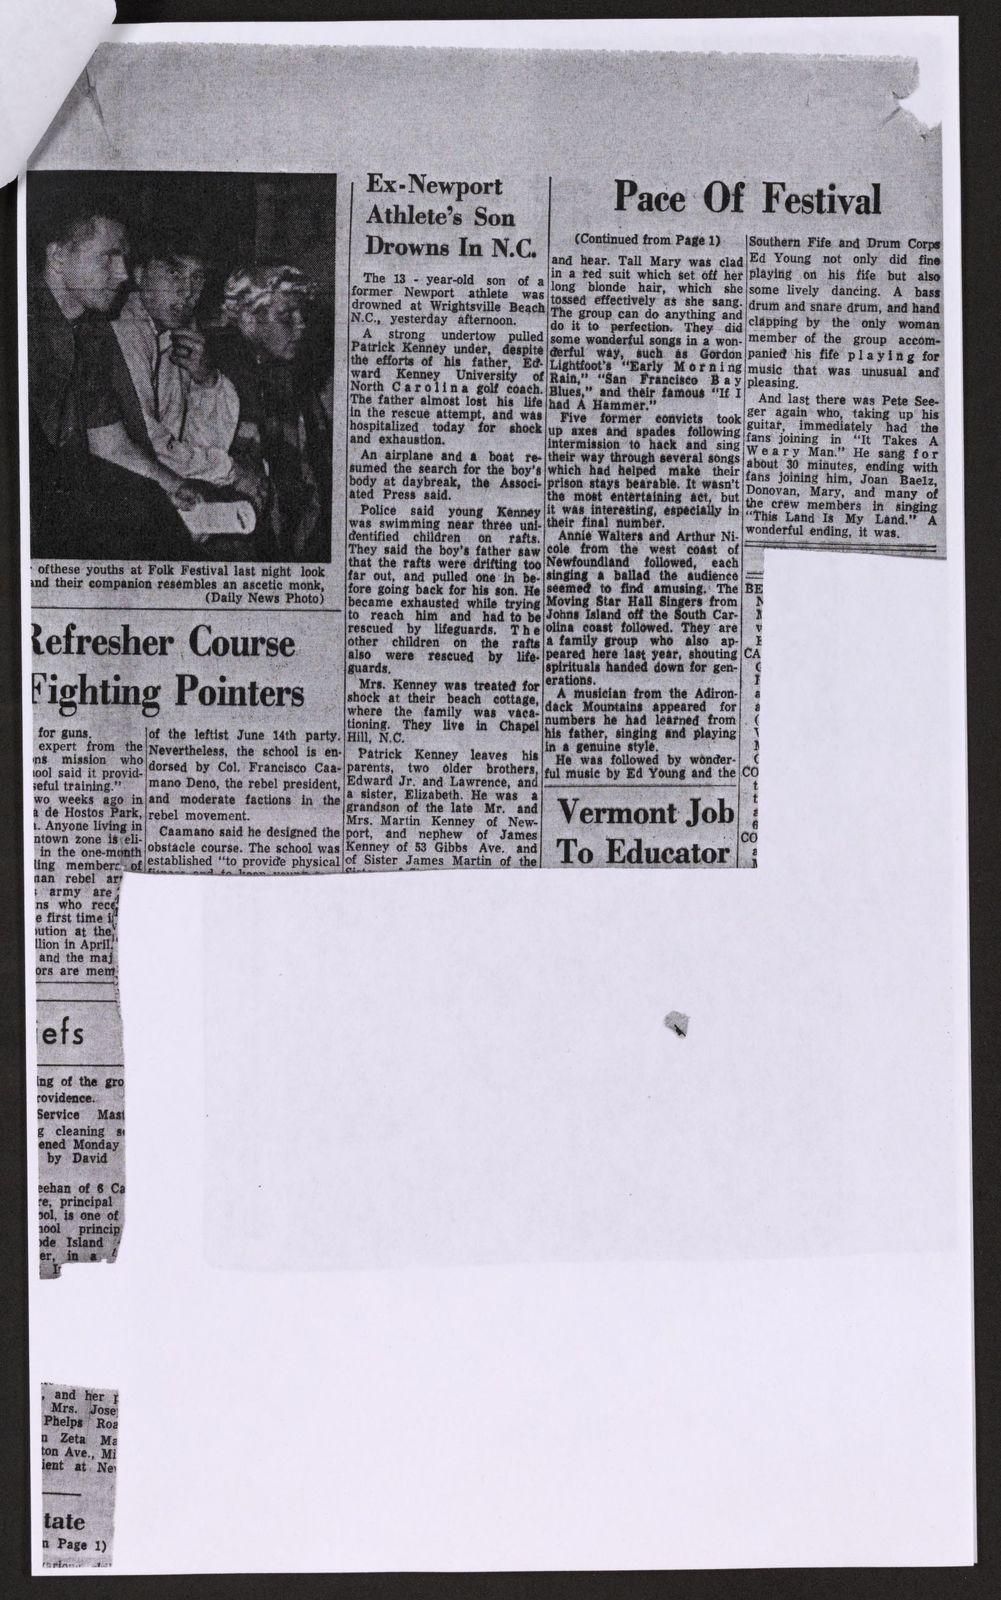 Alan Lomax Collection, Manuscripts, Newport Folk Foundation